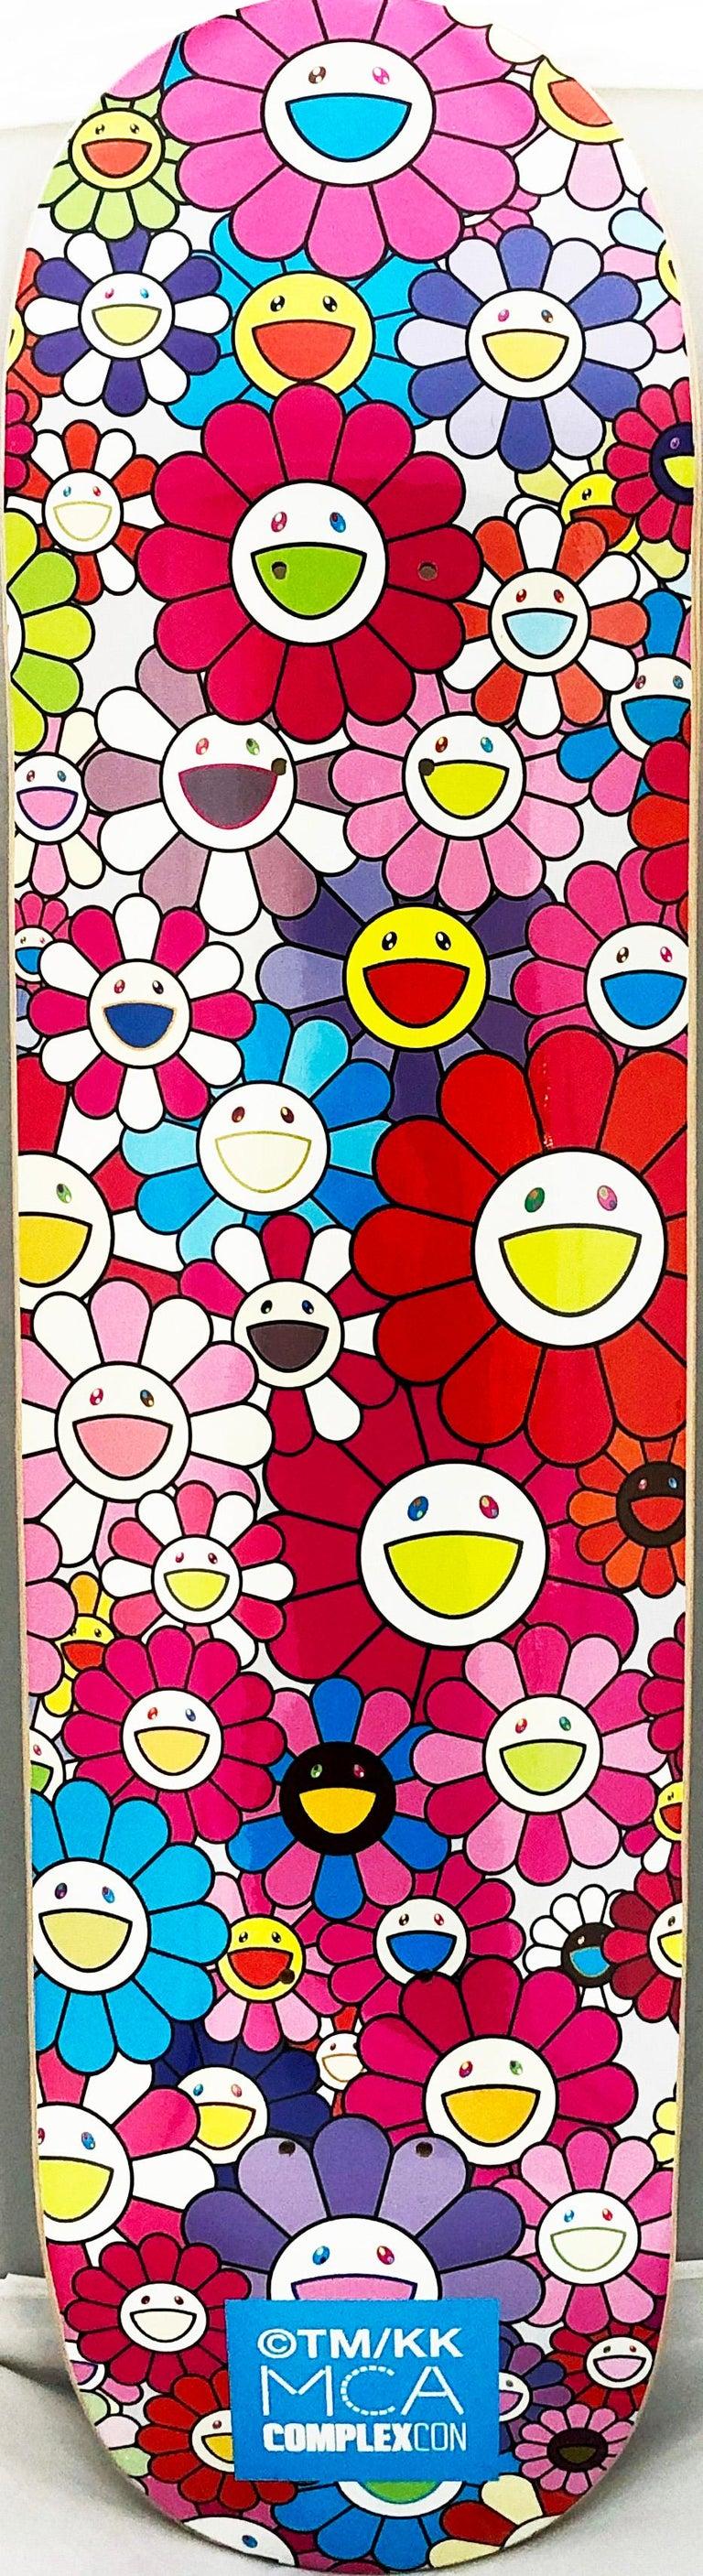 Set of 3 Takashi Murakami Flowers Skateboard Decks A vibrant triptych of Takashi Murakami wall art